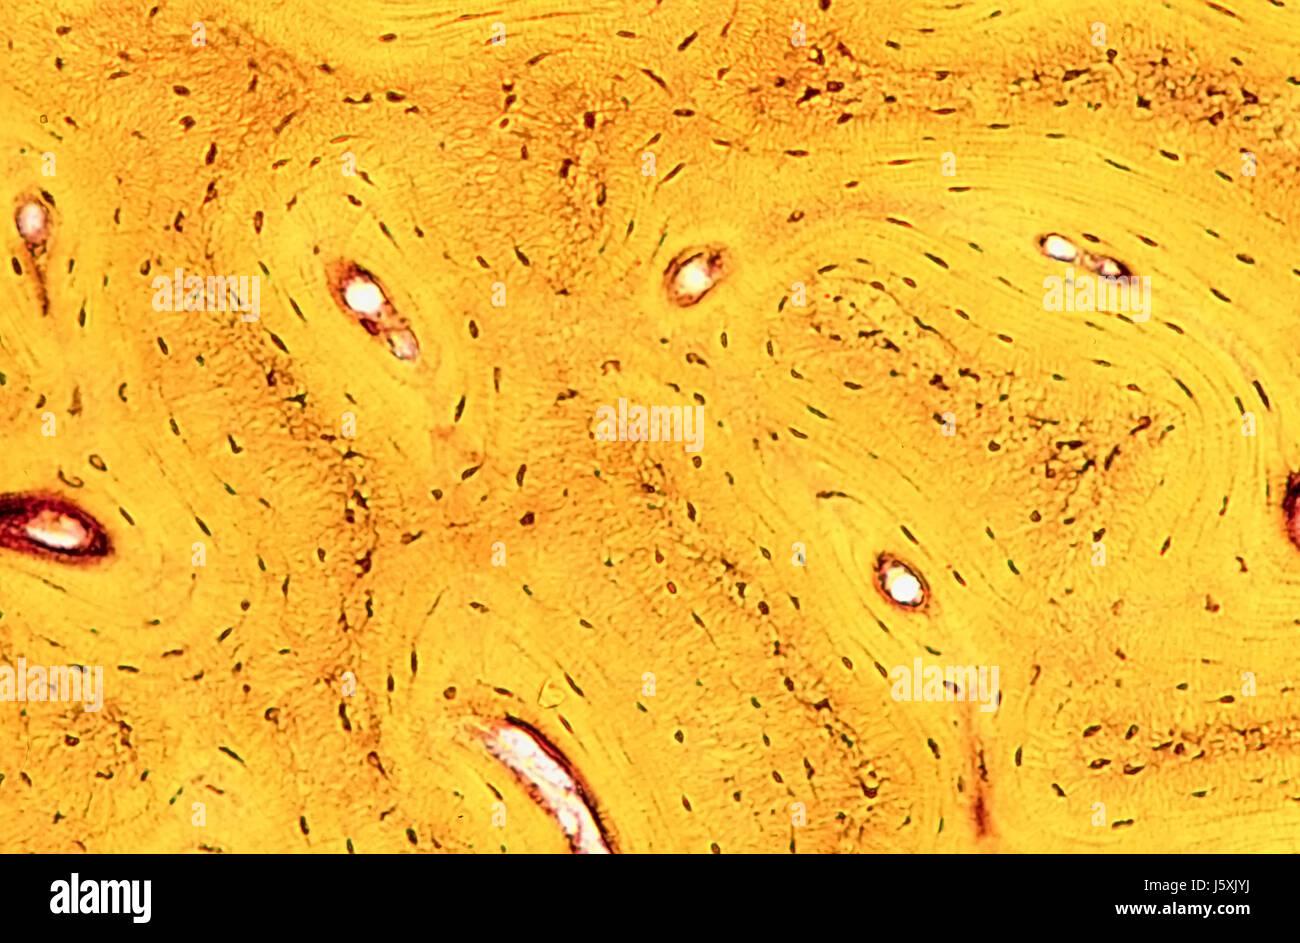 bone tissue of humans - Stock Image